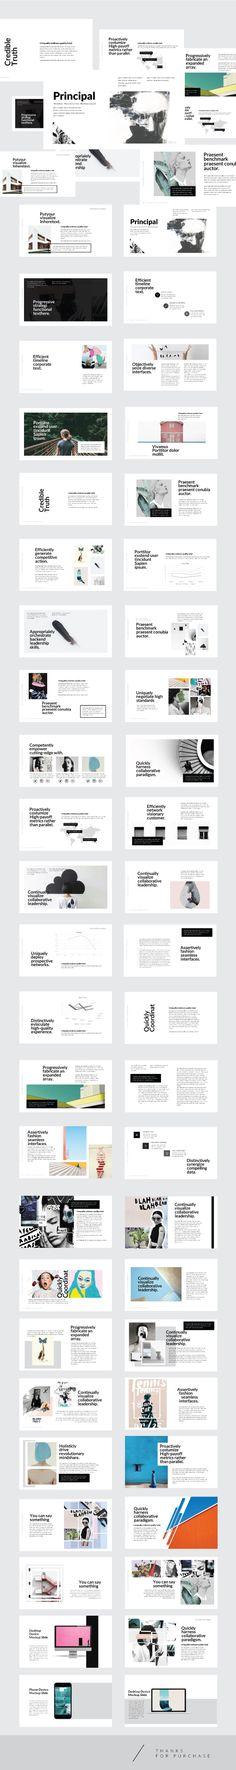 Port - Creative Template Powerpoint